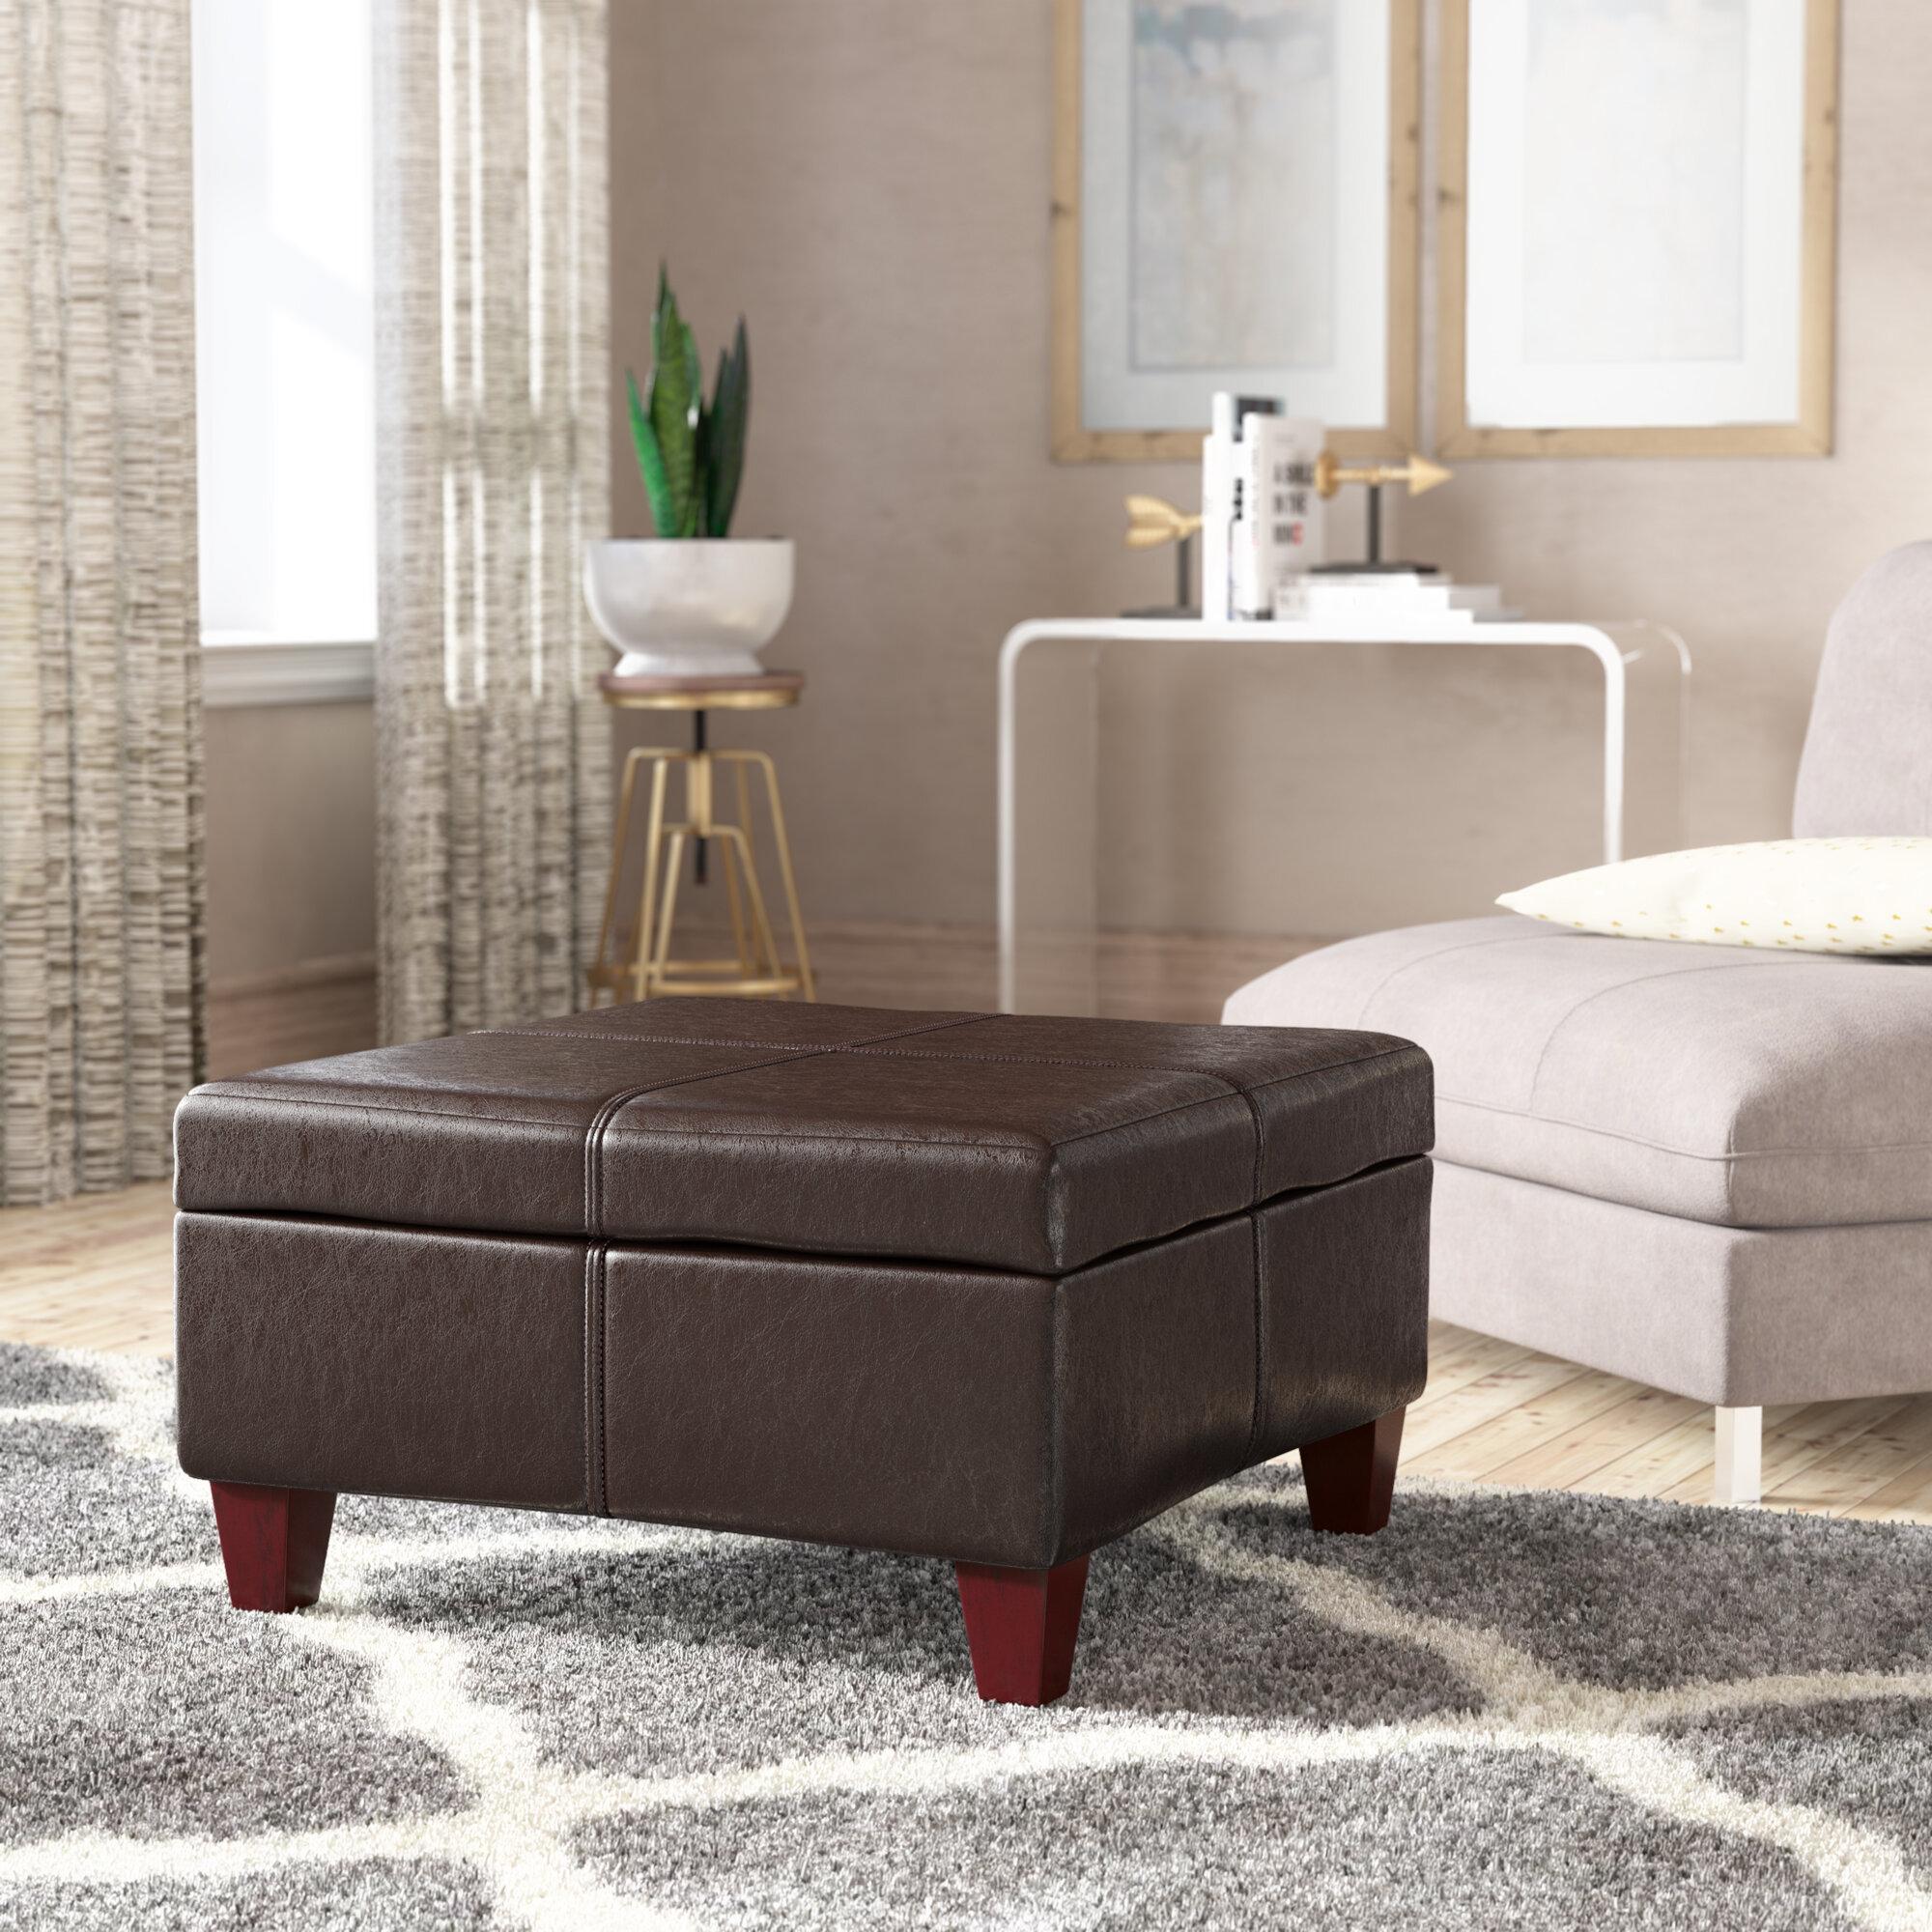 Swell Alcott Hill Donellan Storage Ottoman Reviews Wayfair Short Links Chair Design For Home Short Linksinfo